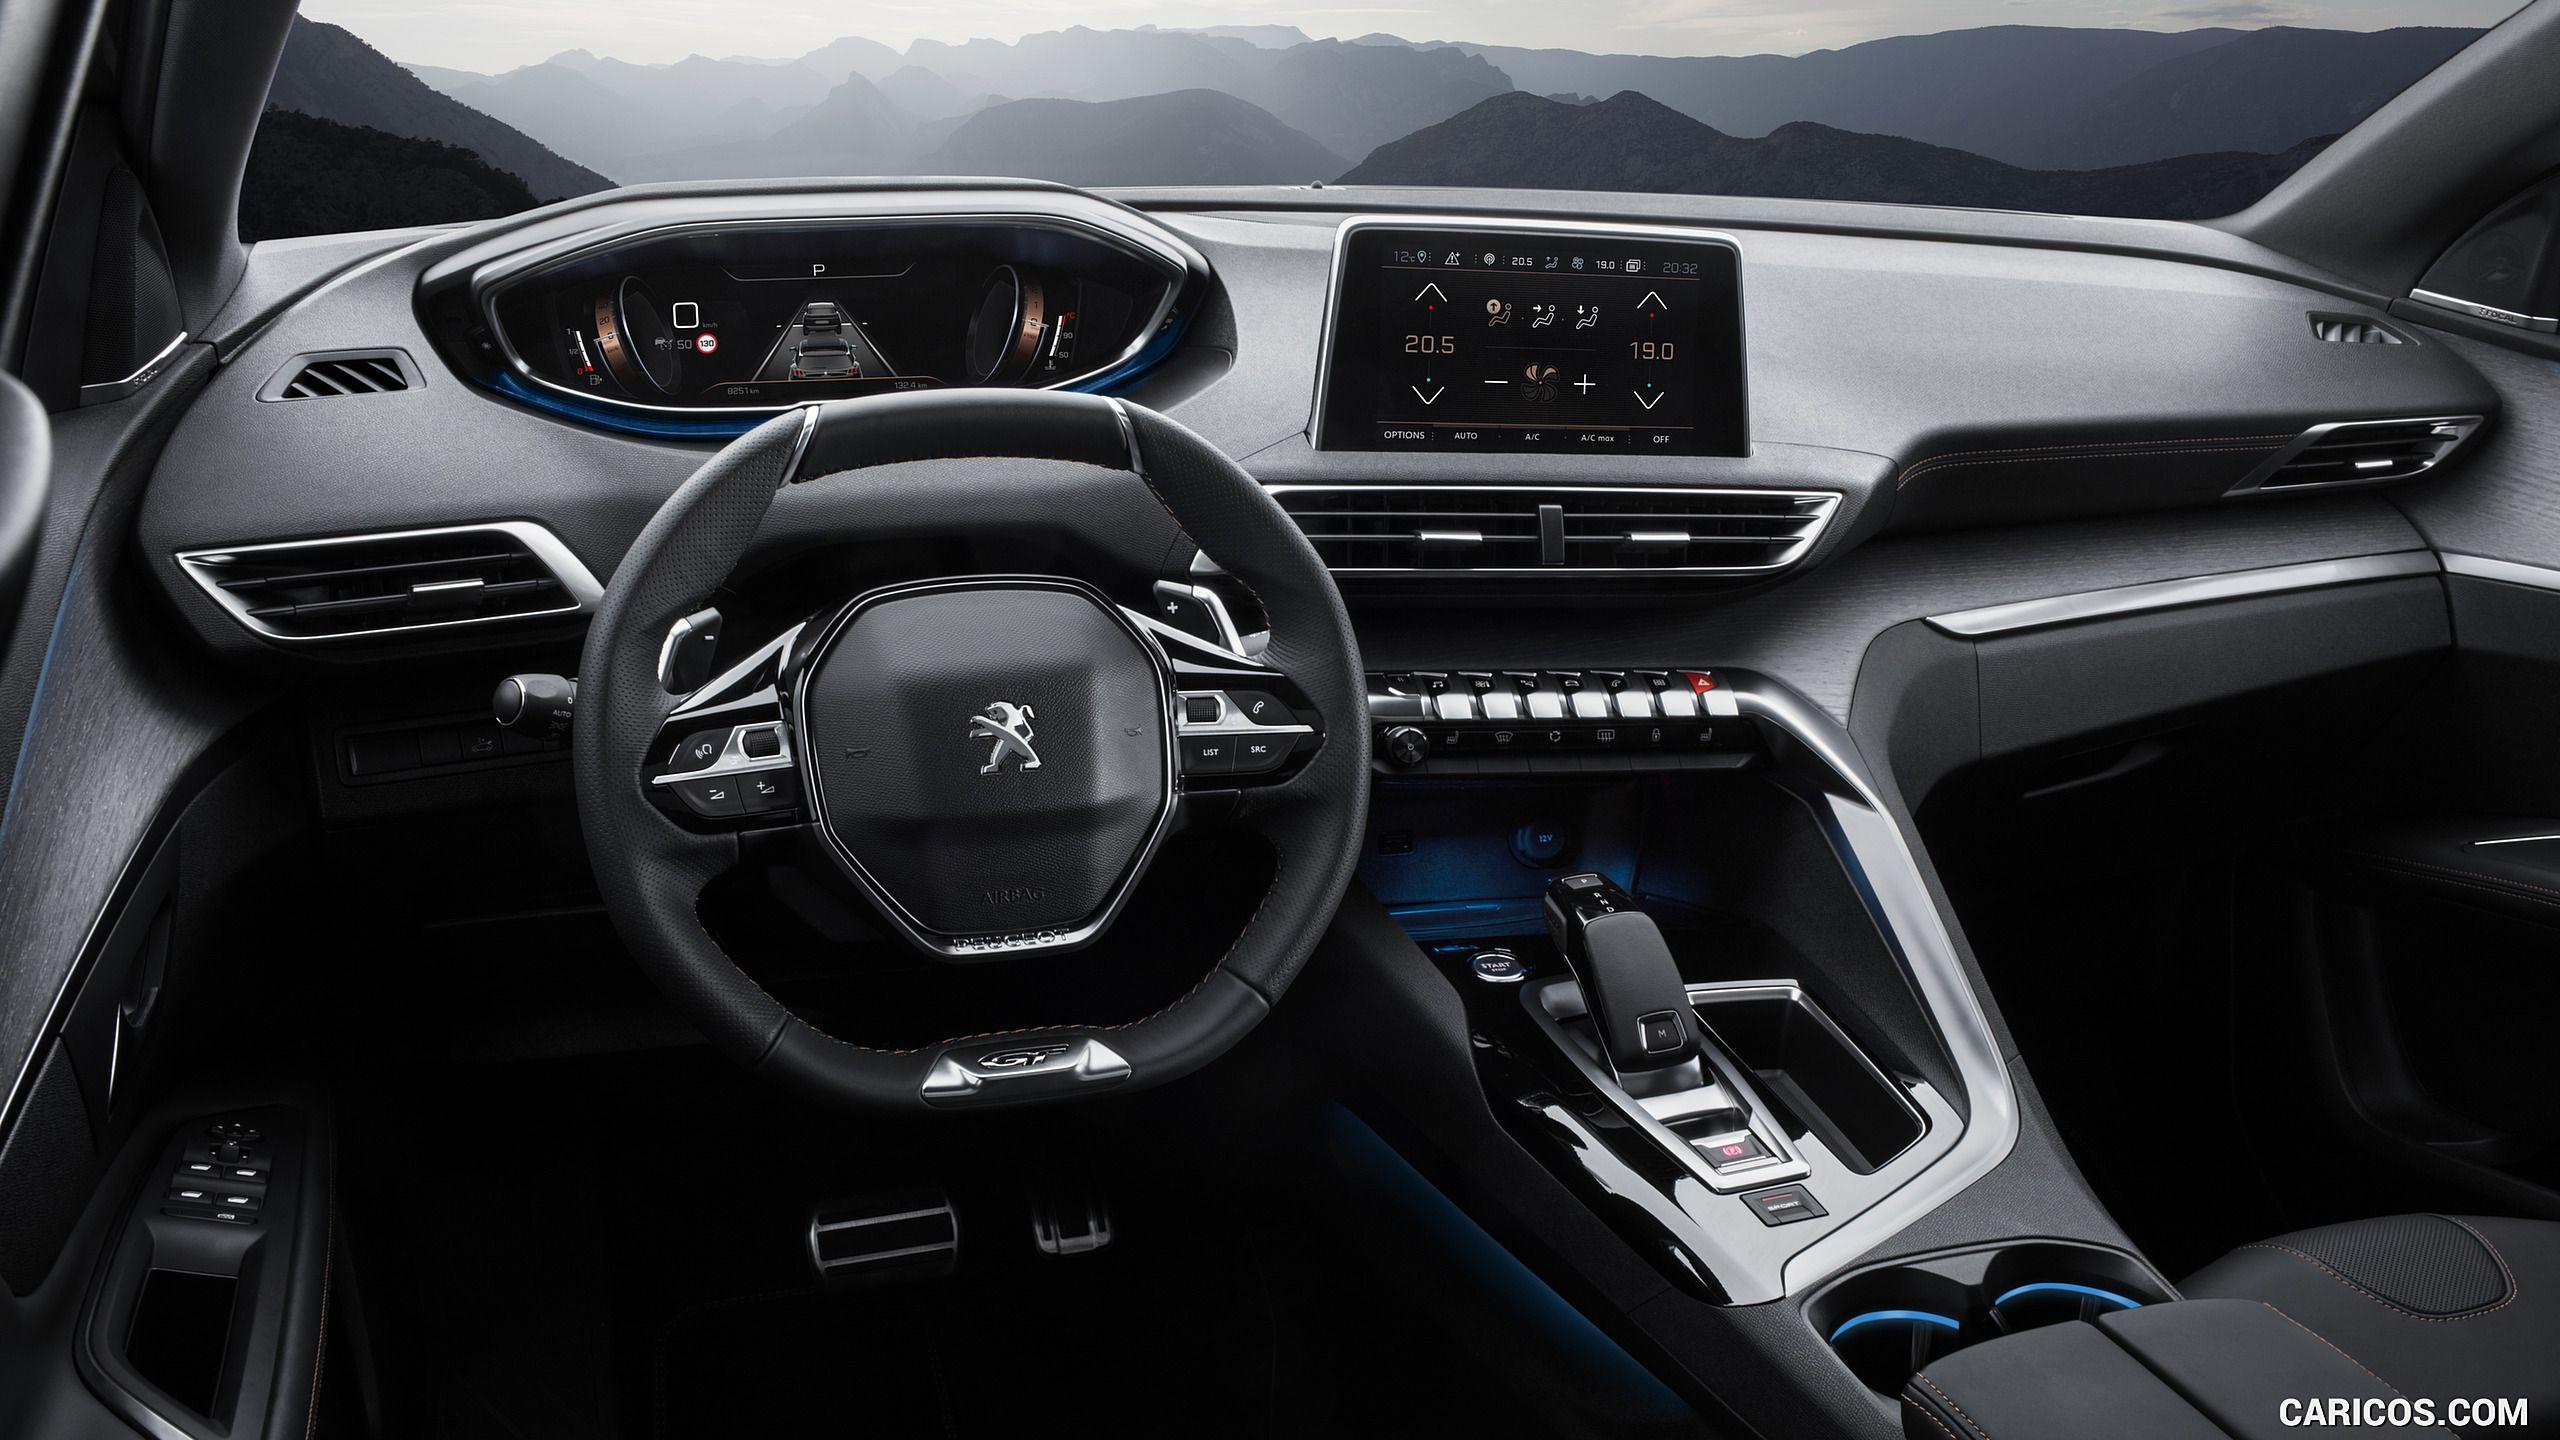 2017 Peugeot 3008 Gt Peugeot 3008 Peugeot Diesel Cars